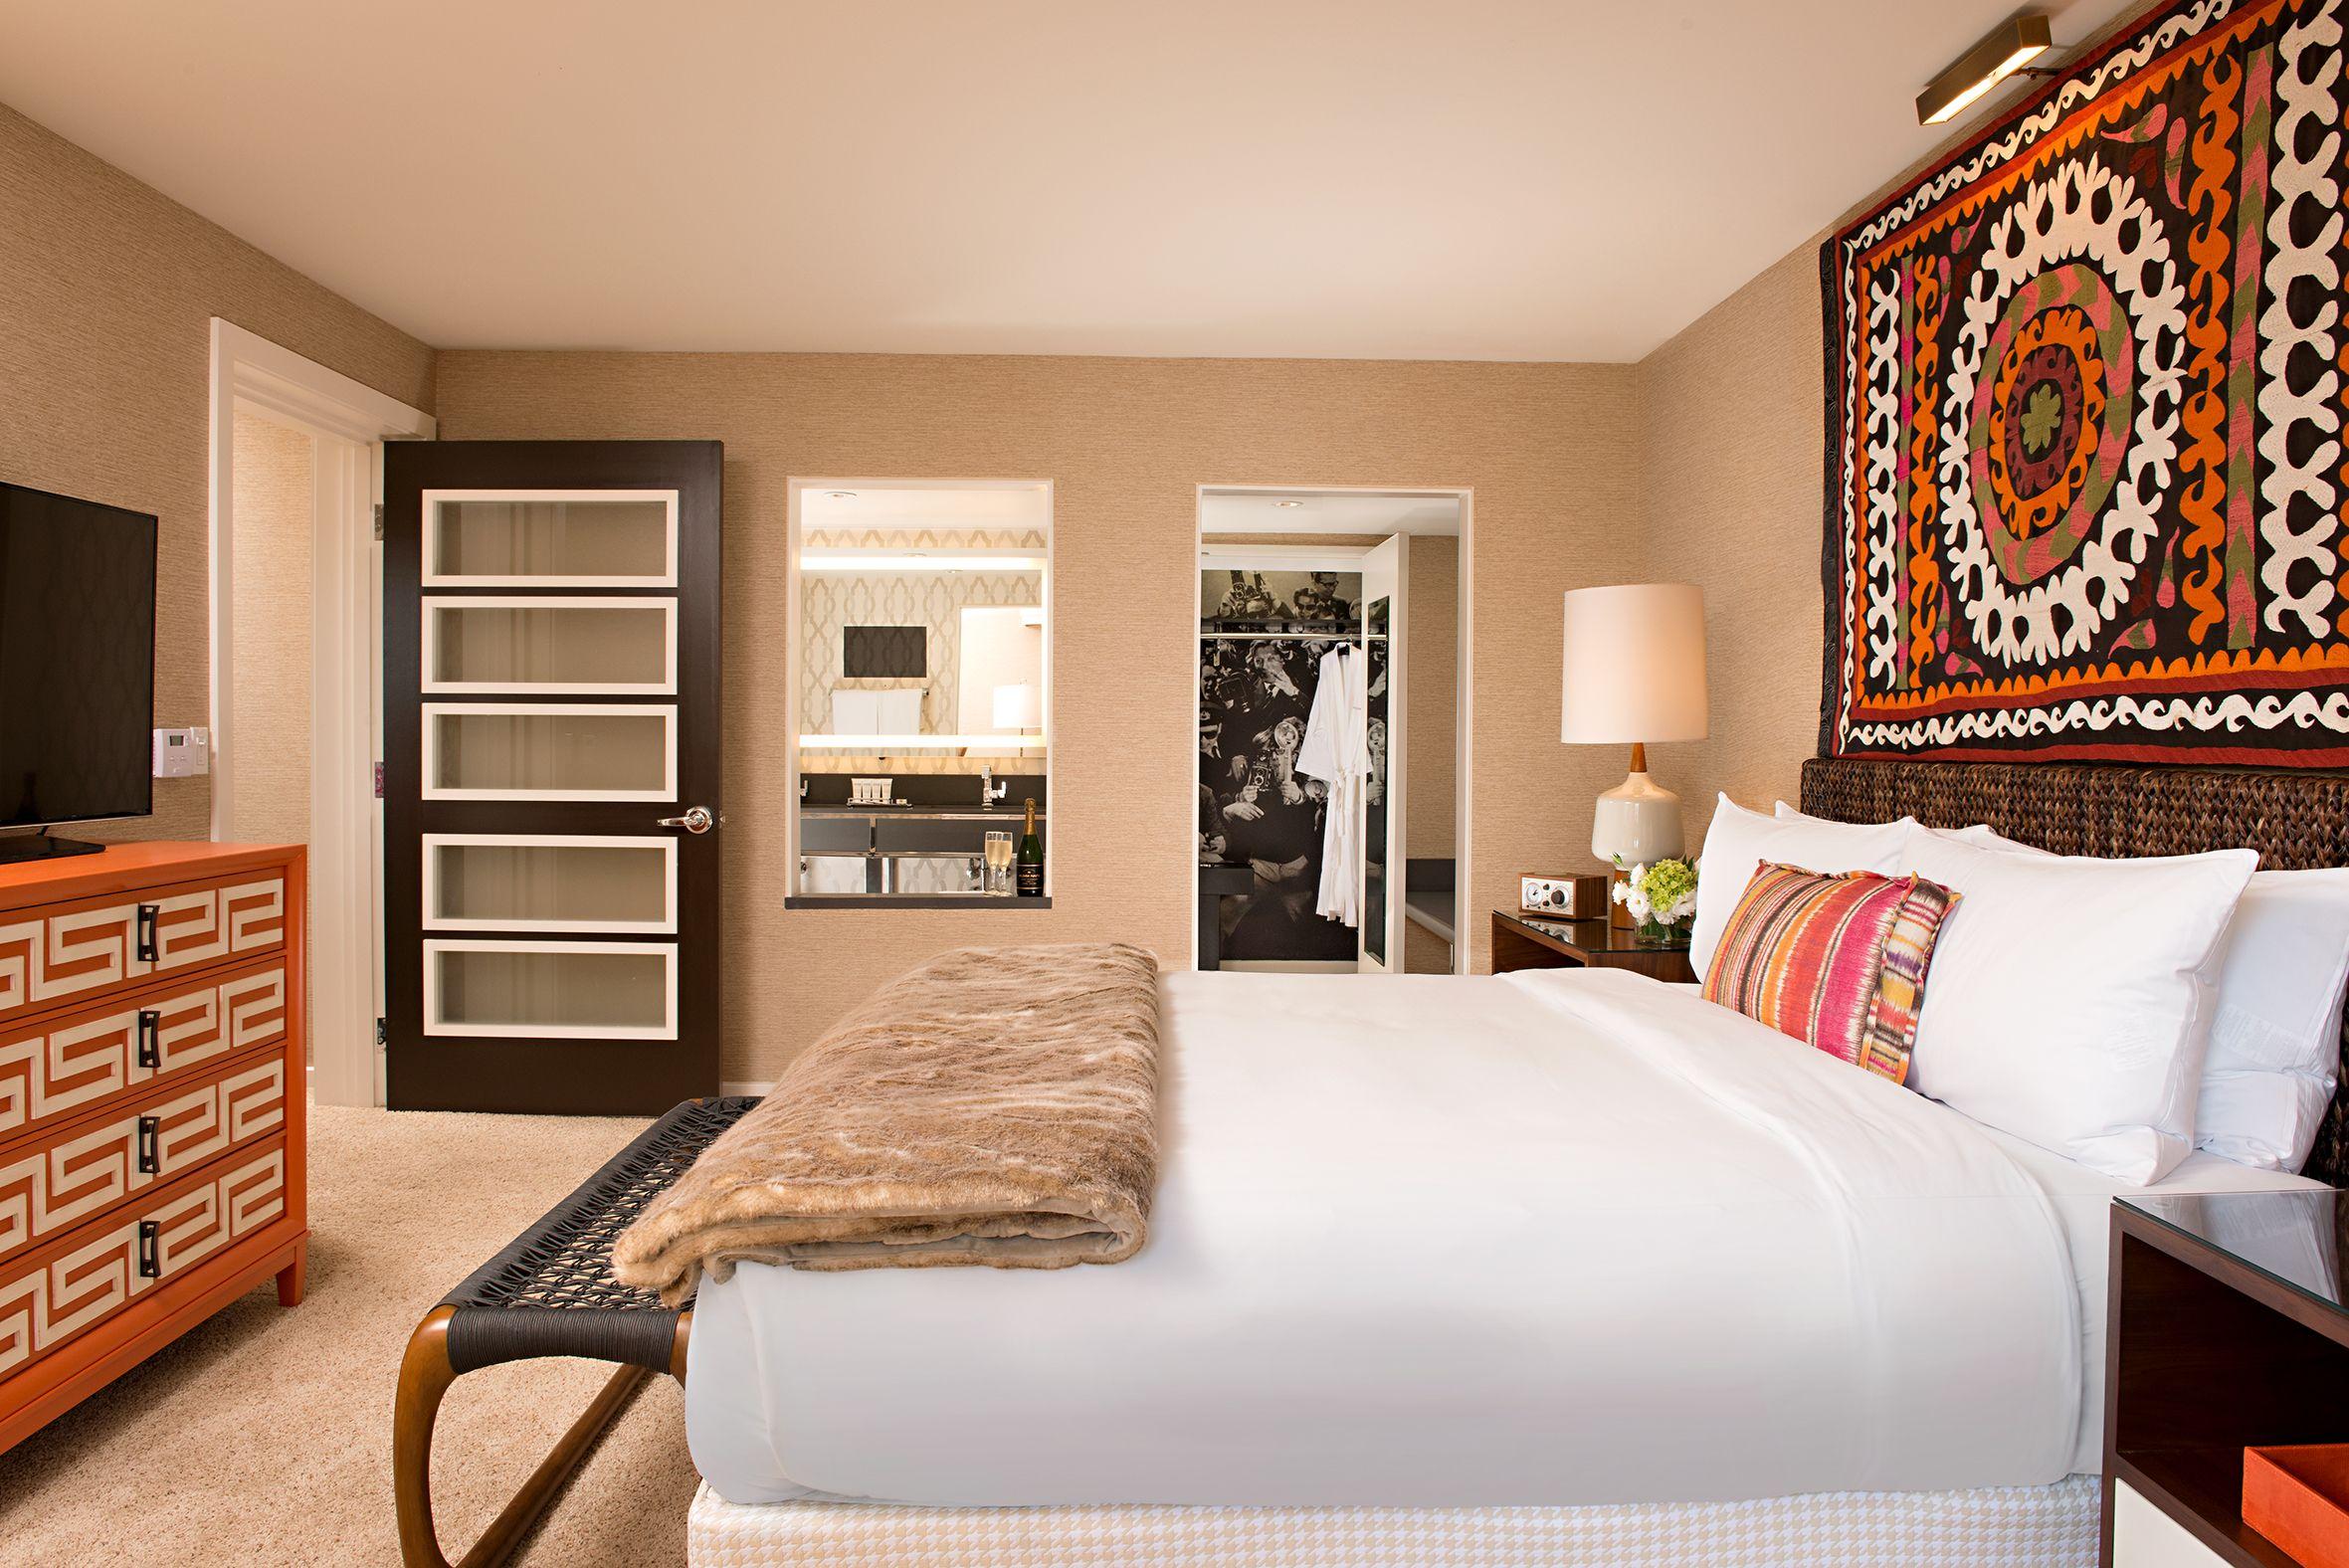 James Suite Bedroom Hollywood Hotel Los Angeles Hotels Hotel